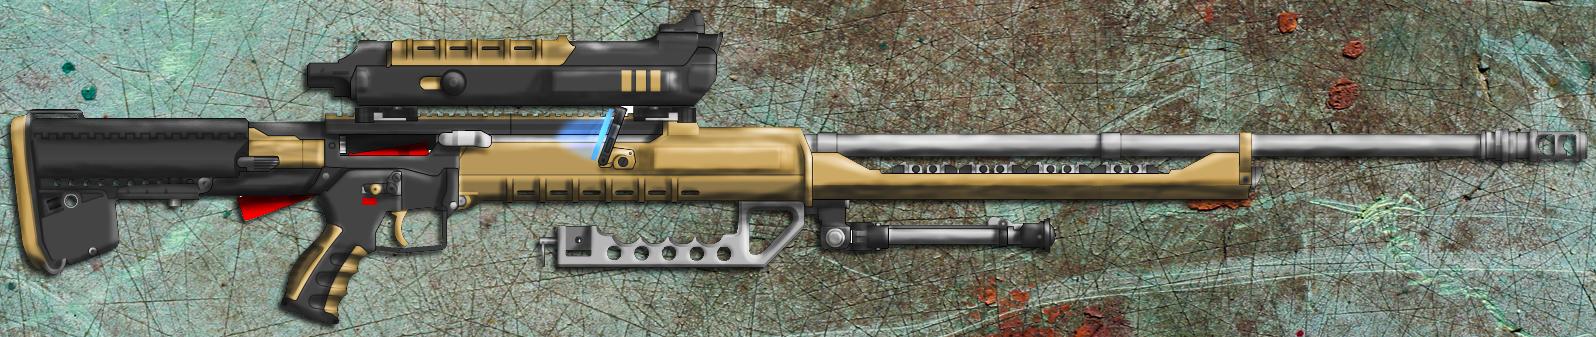 Cyberpunk Sniper by Lord-Malachi